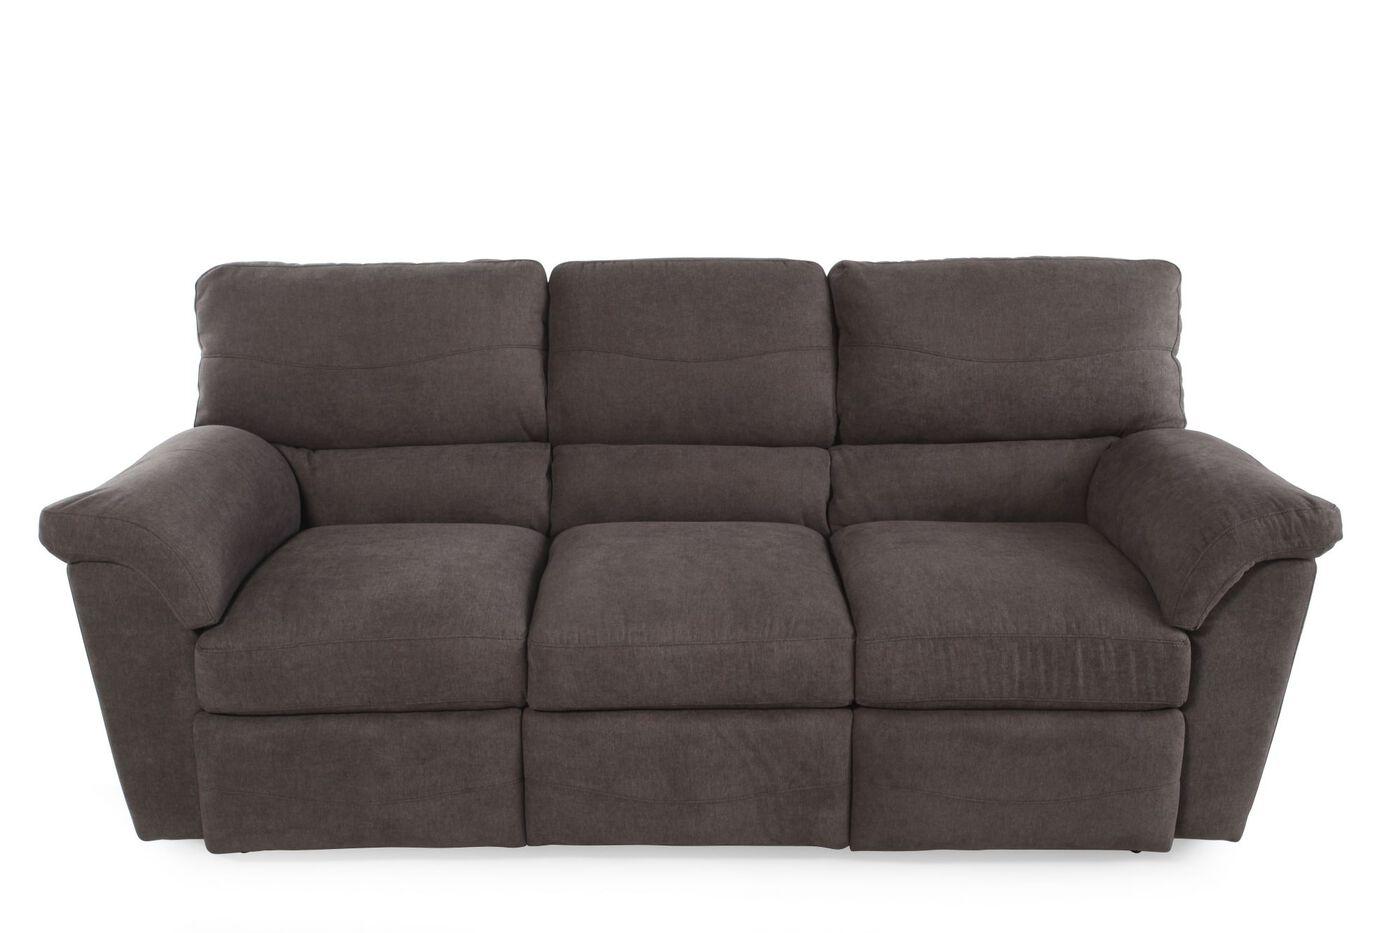 La z boy reese granite reclining sofa mathis brothers furniture - Sofa reclinable ...